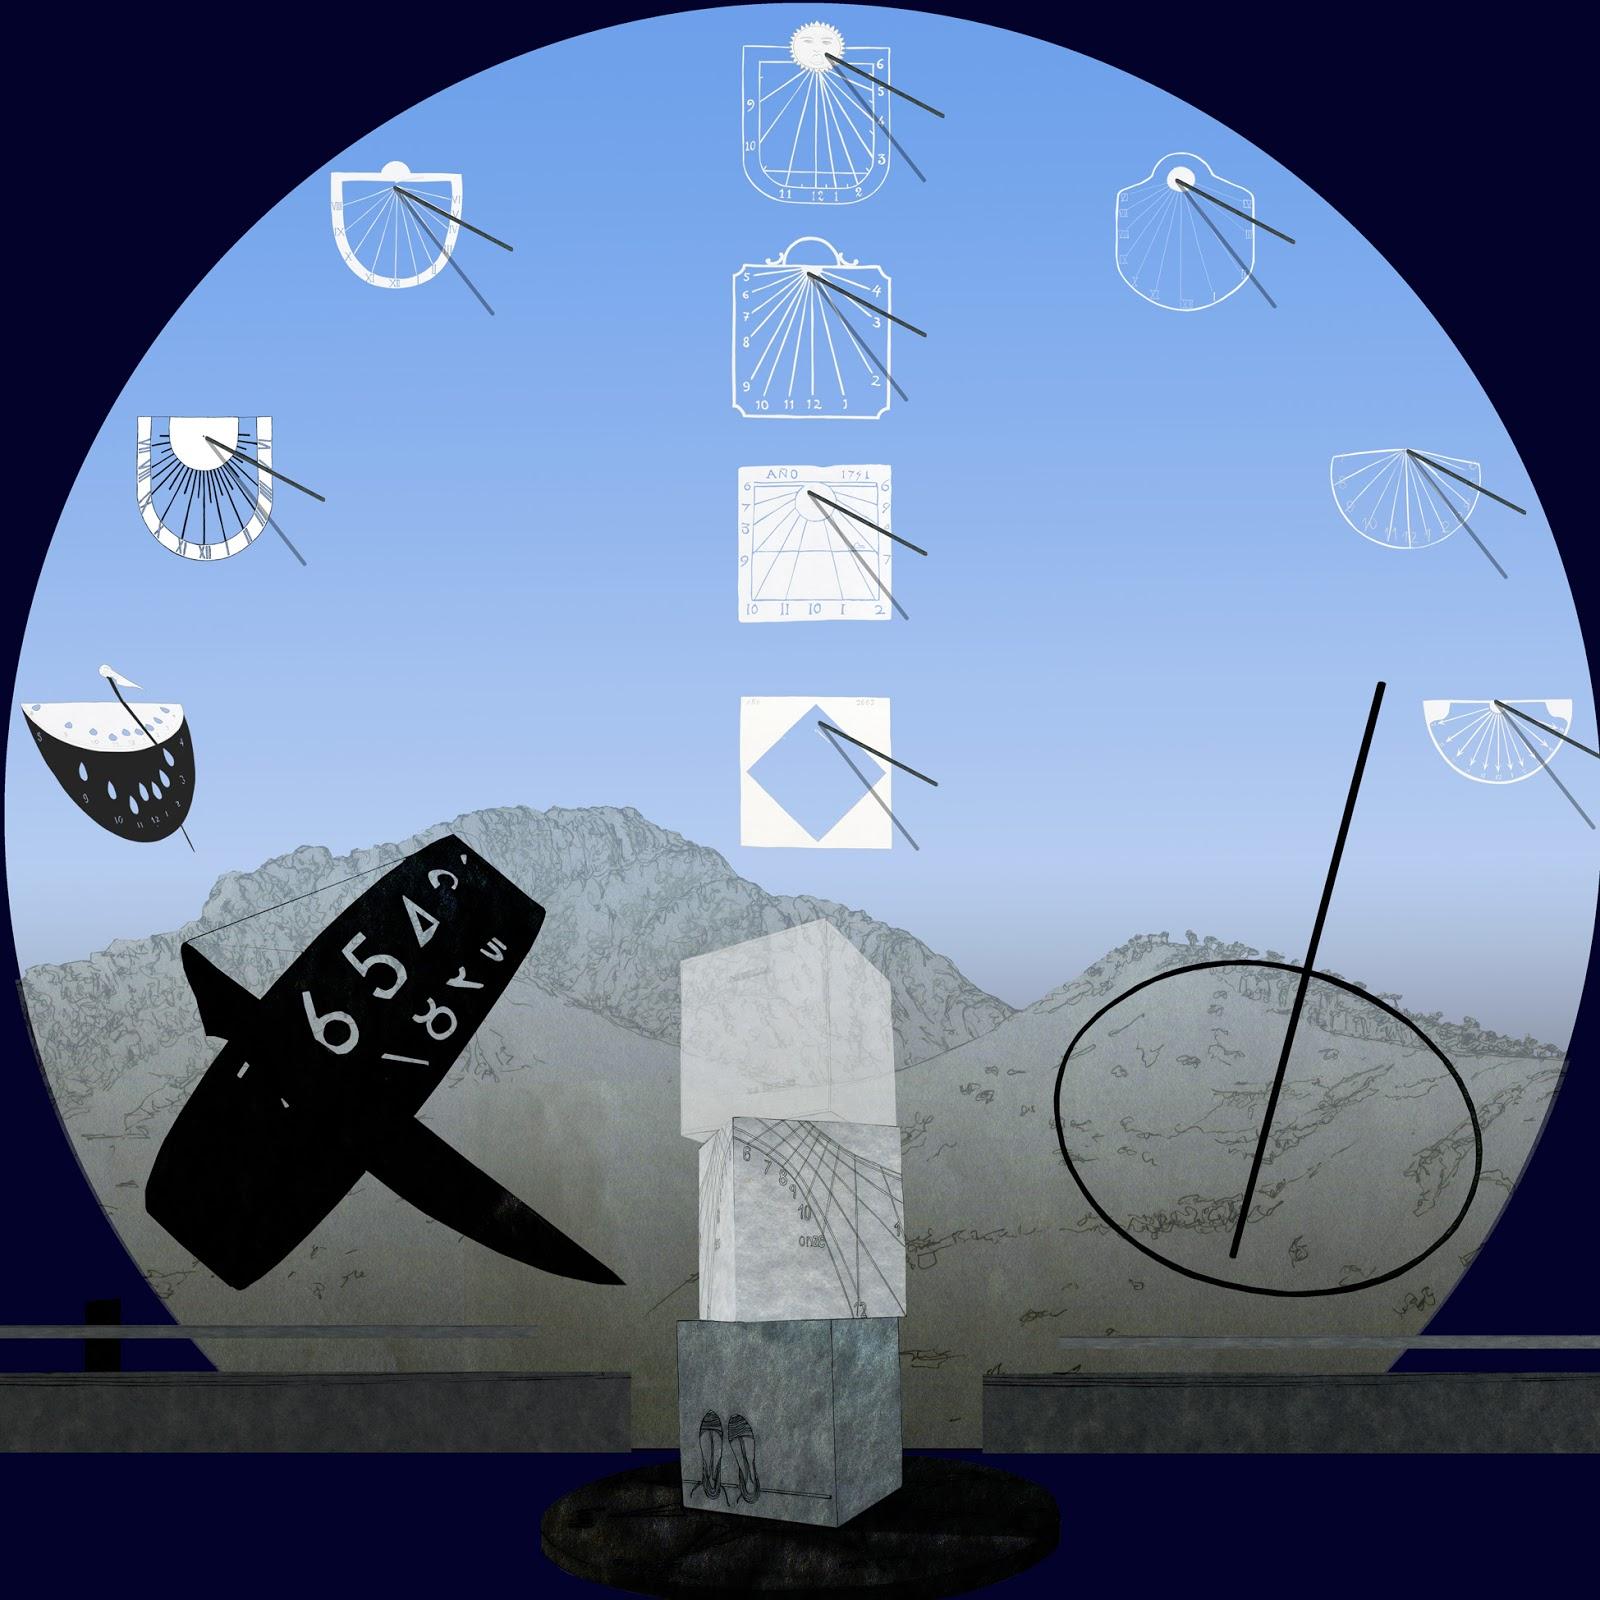 Vall de Albaida, relojes de sol, turismo matematico, dibujo